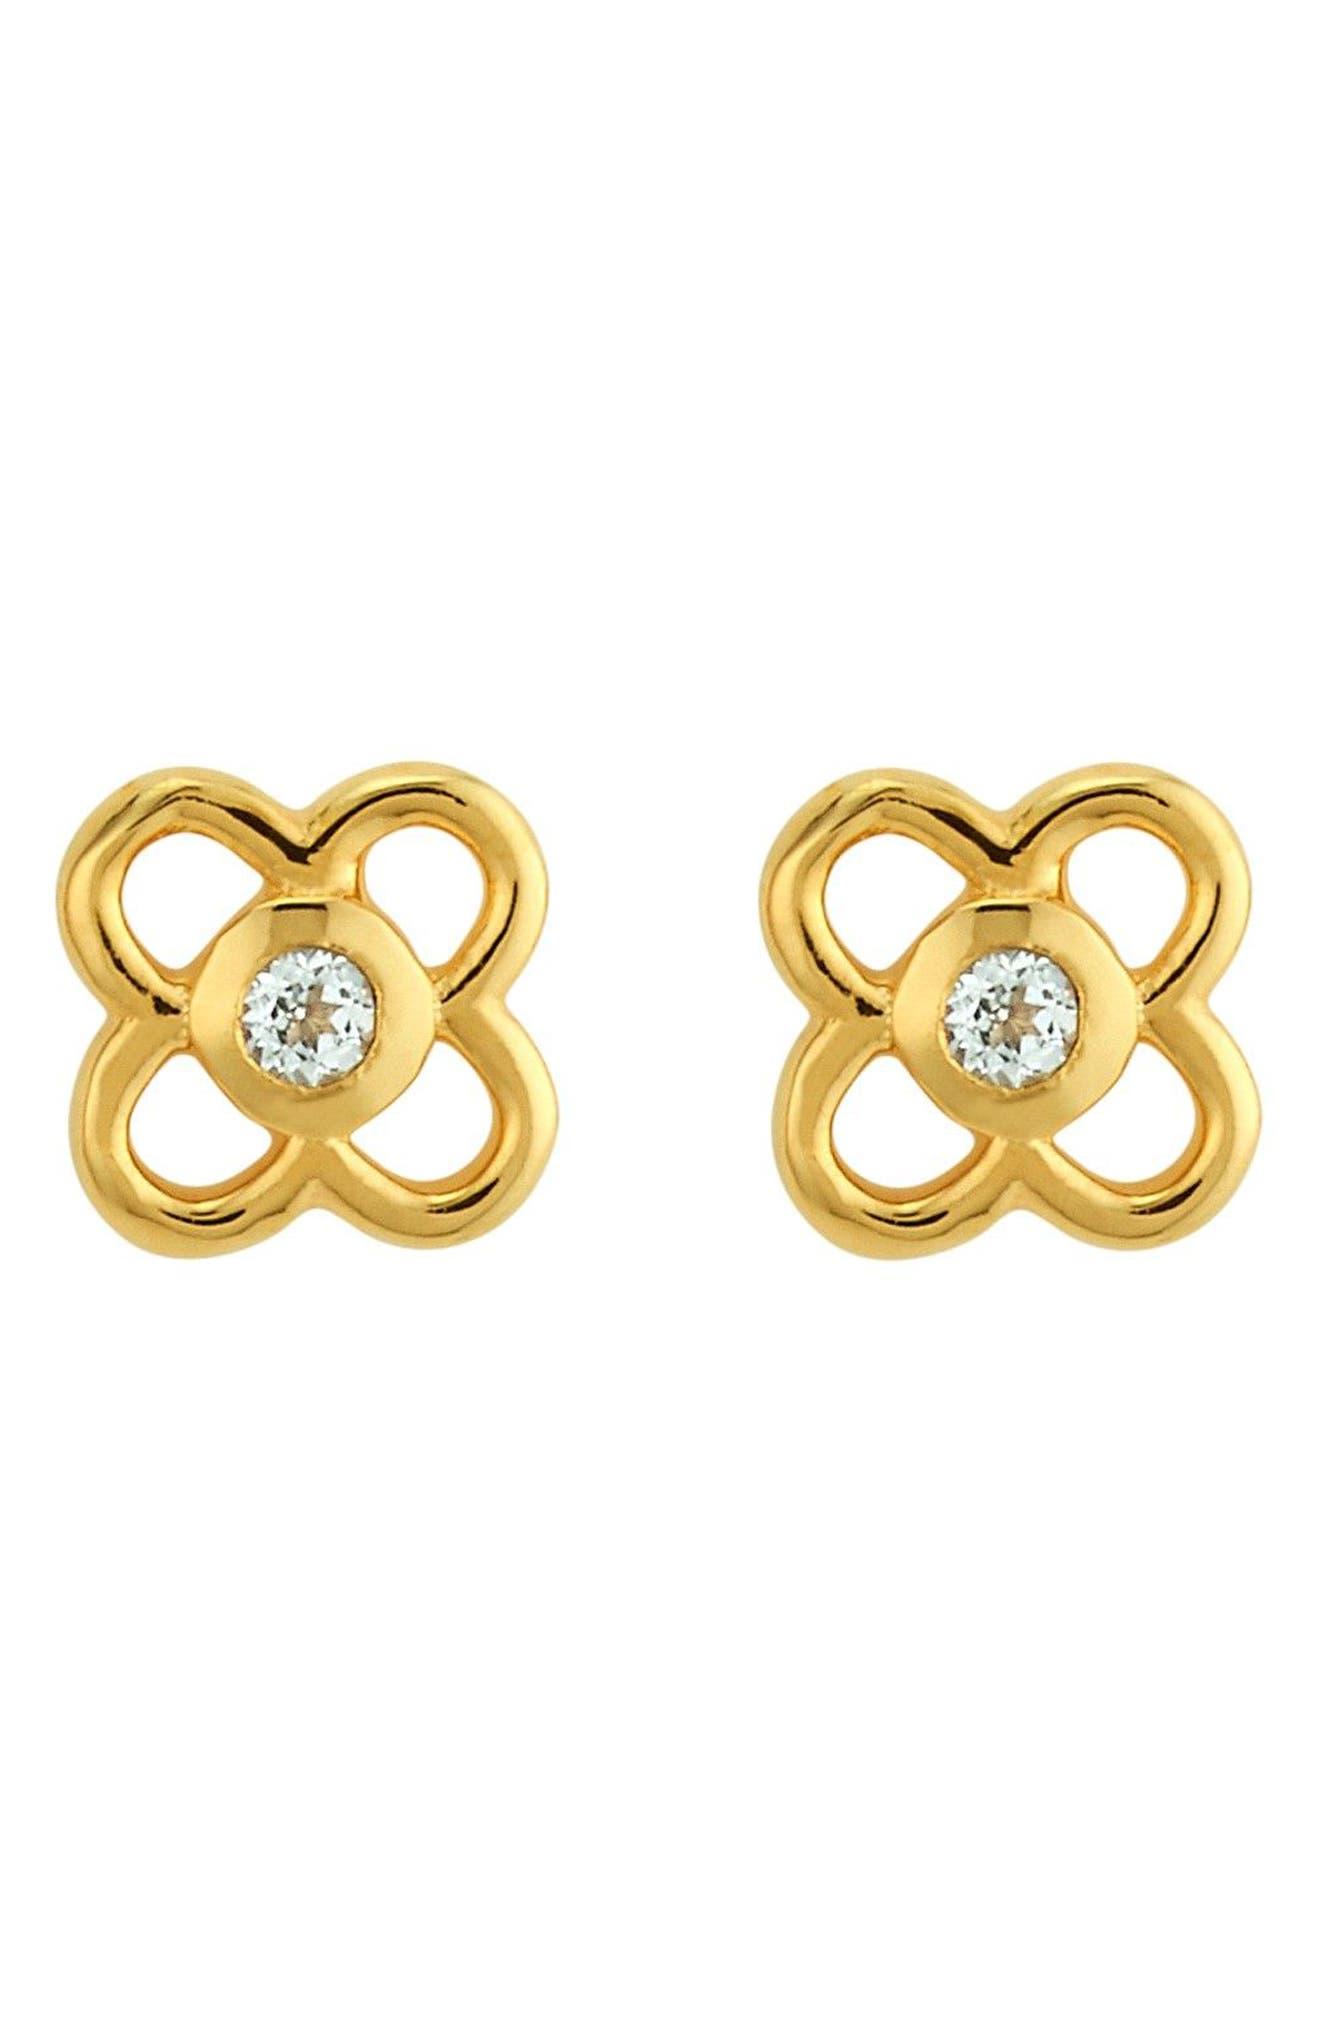 Petite Paloma Stud Earrings,                         Main,                         color, Crystal/ Gold